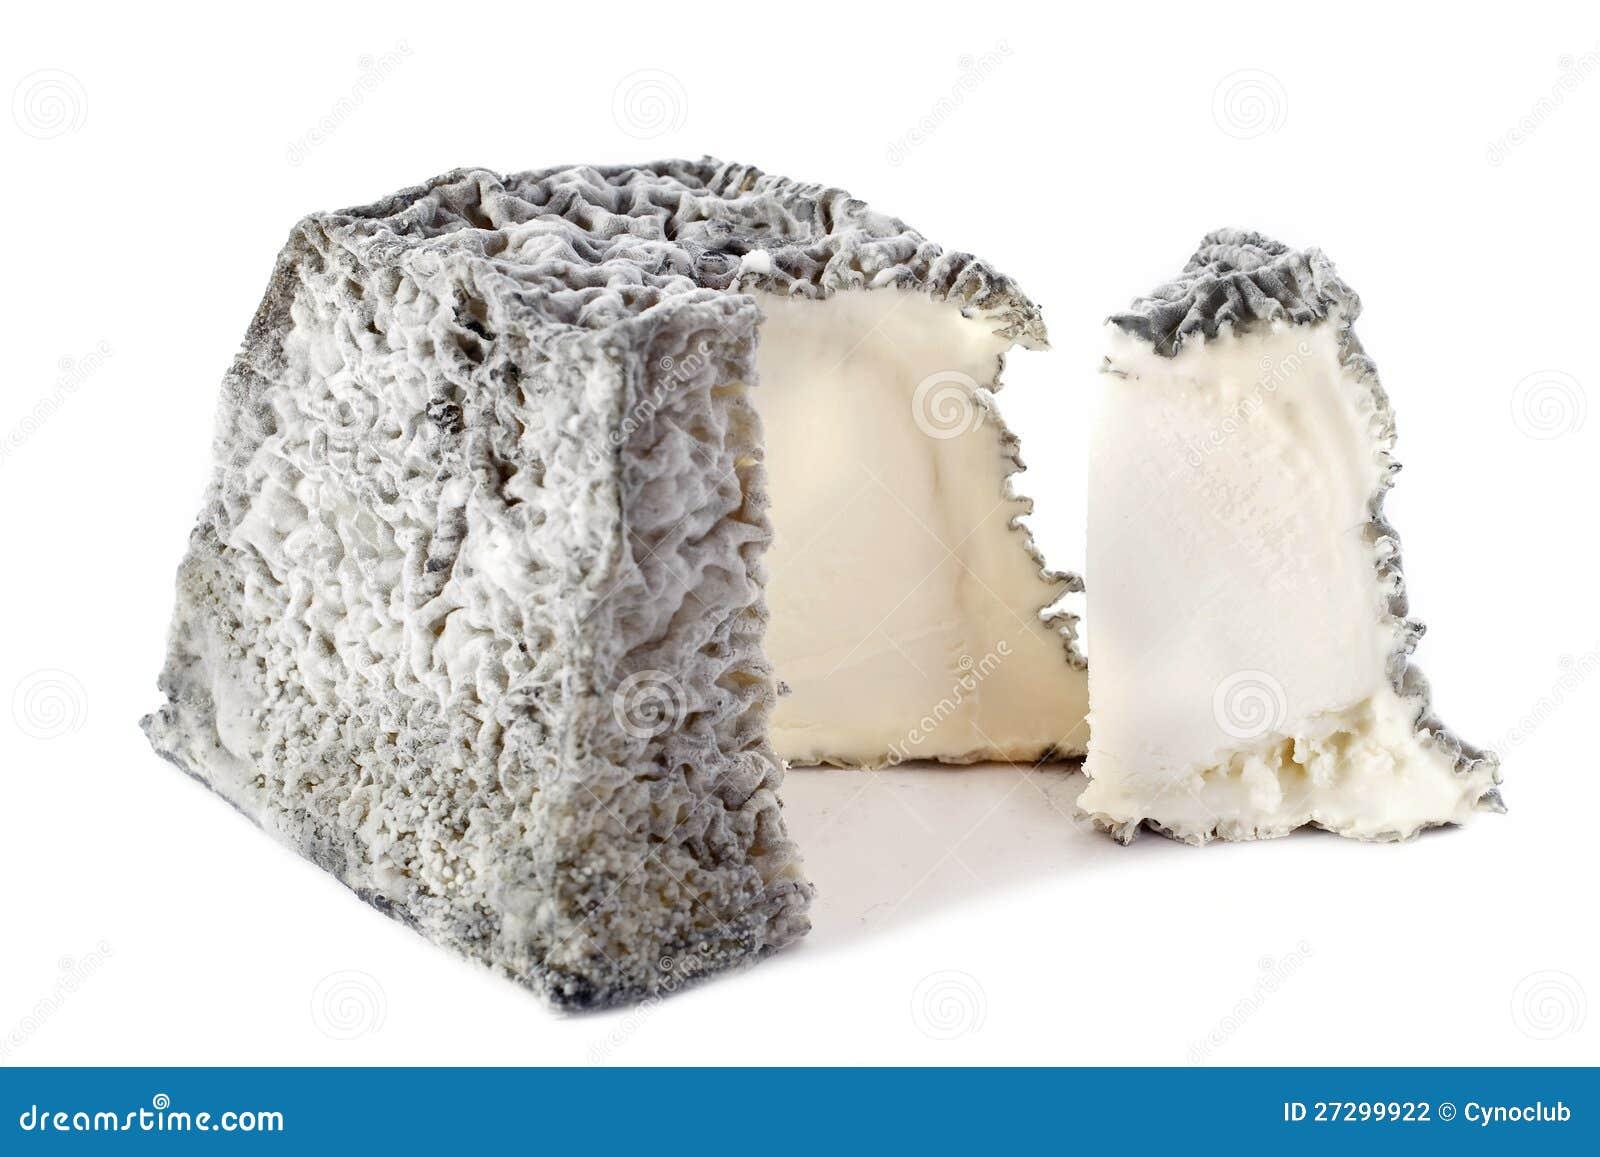 [Image: fromage-de-ch%C3%A8vre-valencay-27299922.jpg]